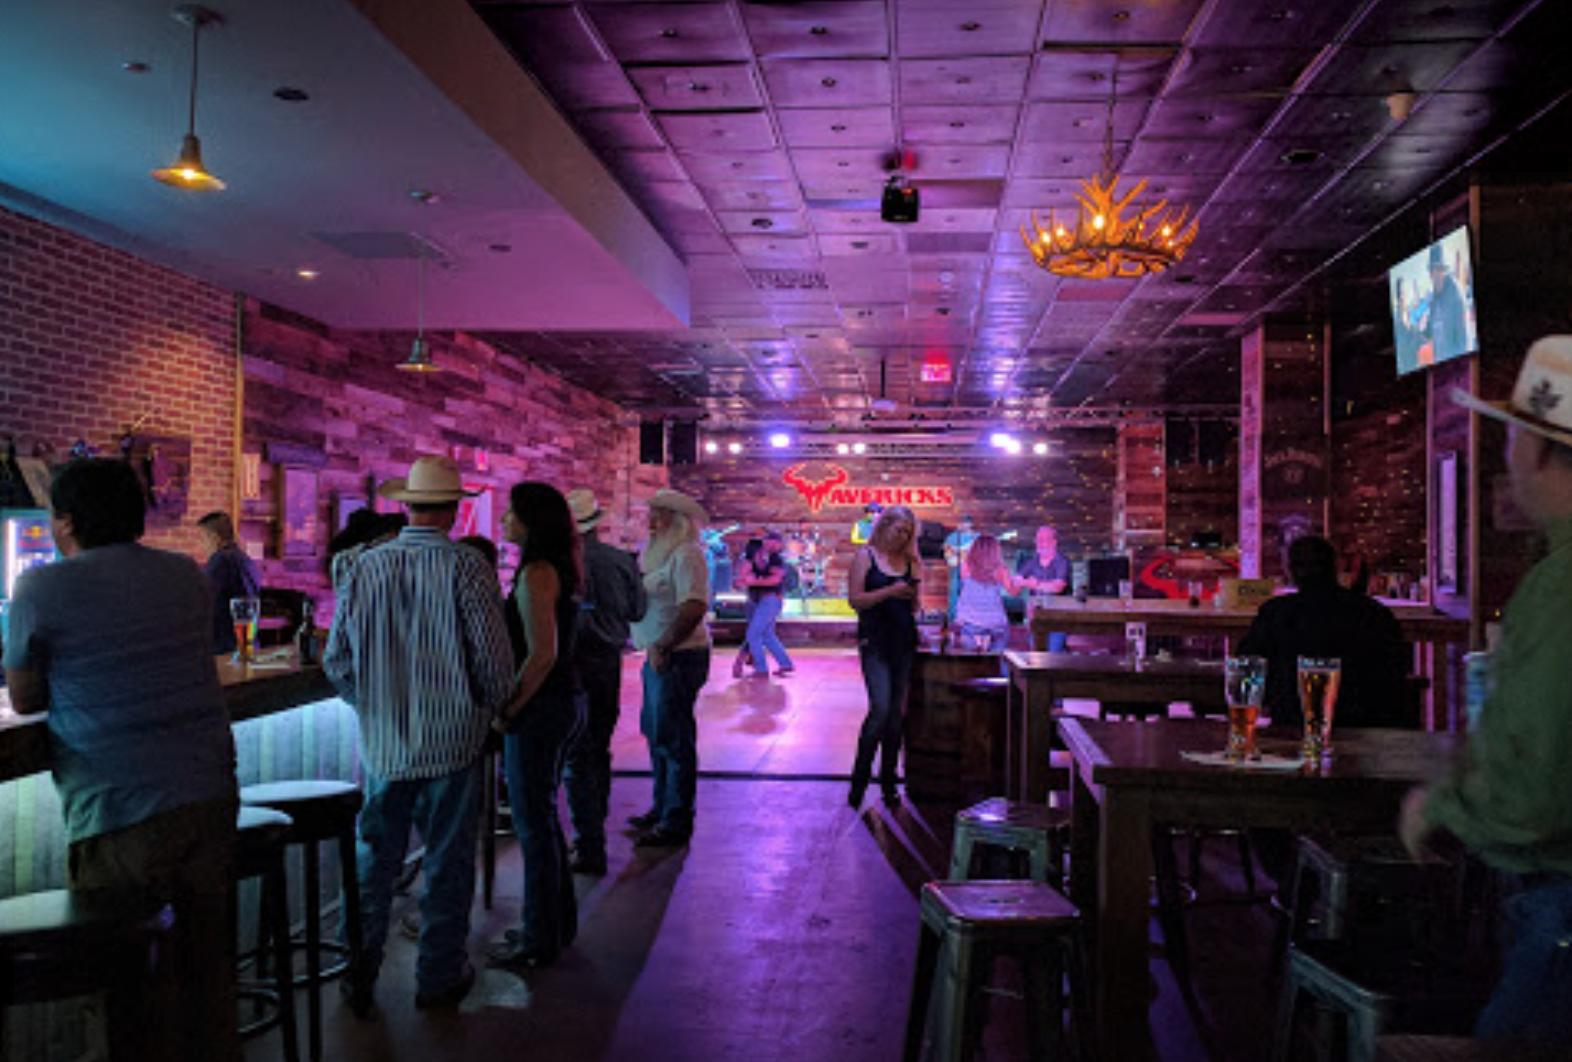 Mavericks Country Lounge in Pleasanton